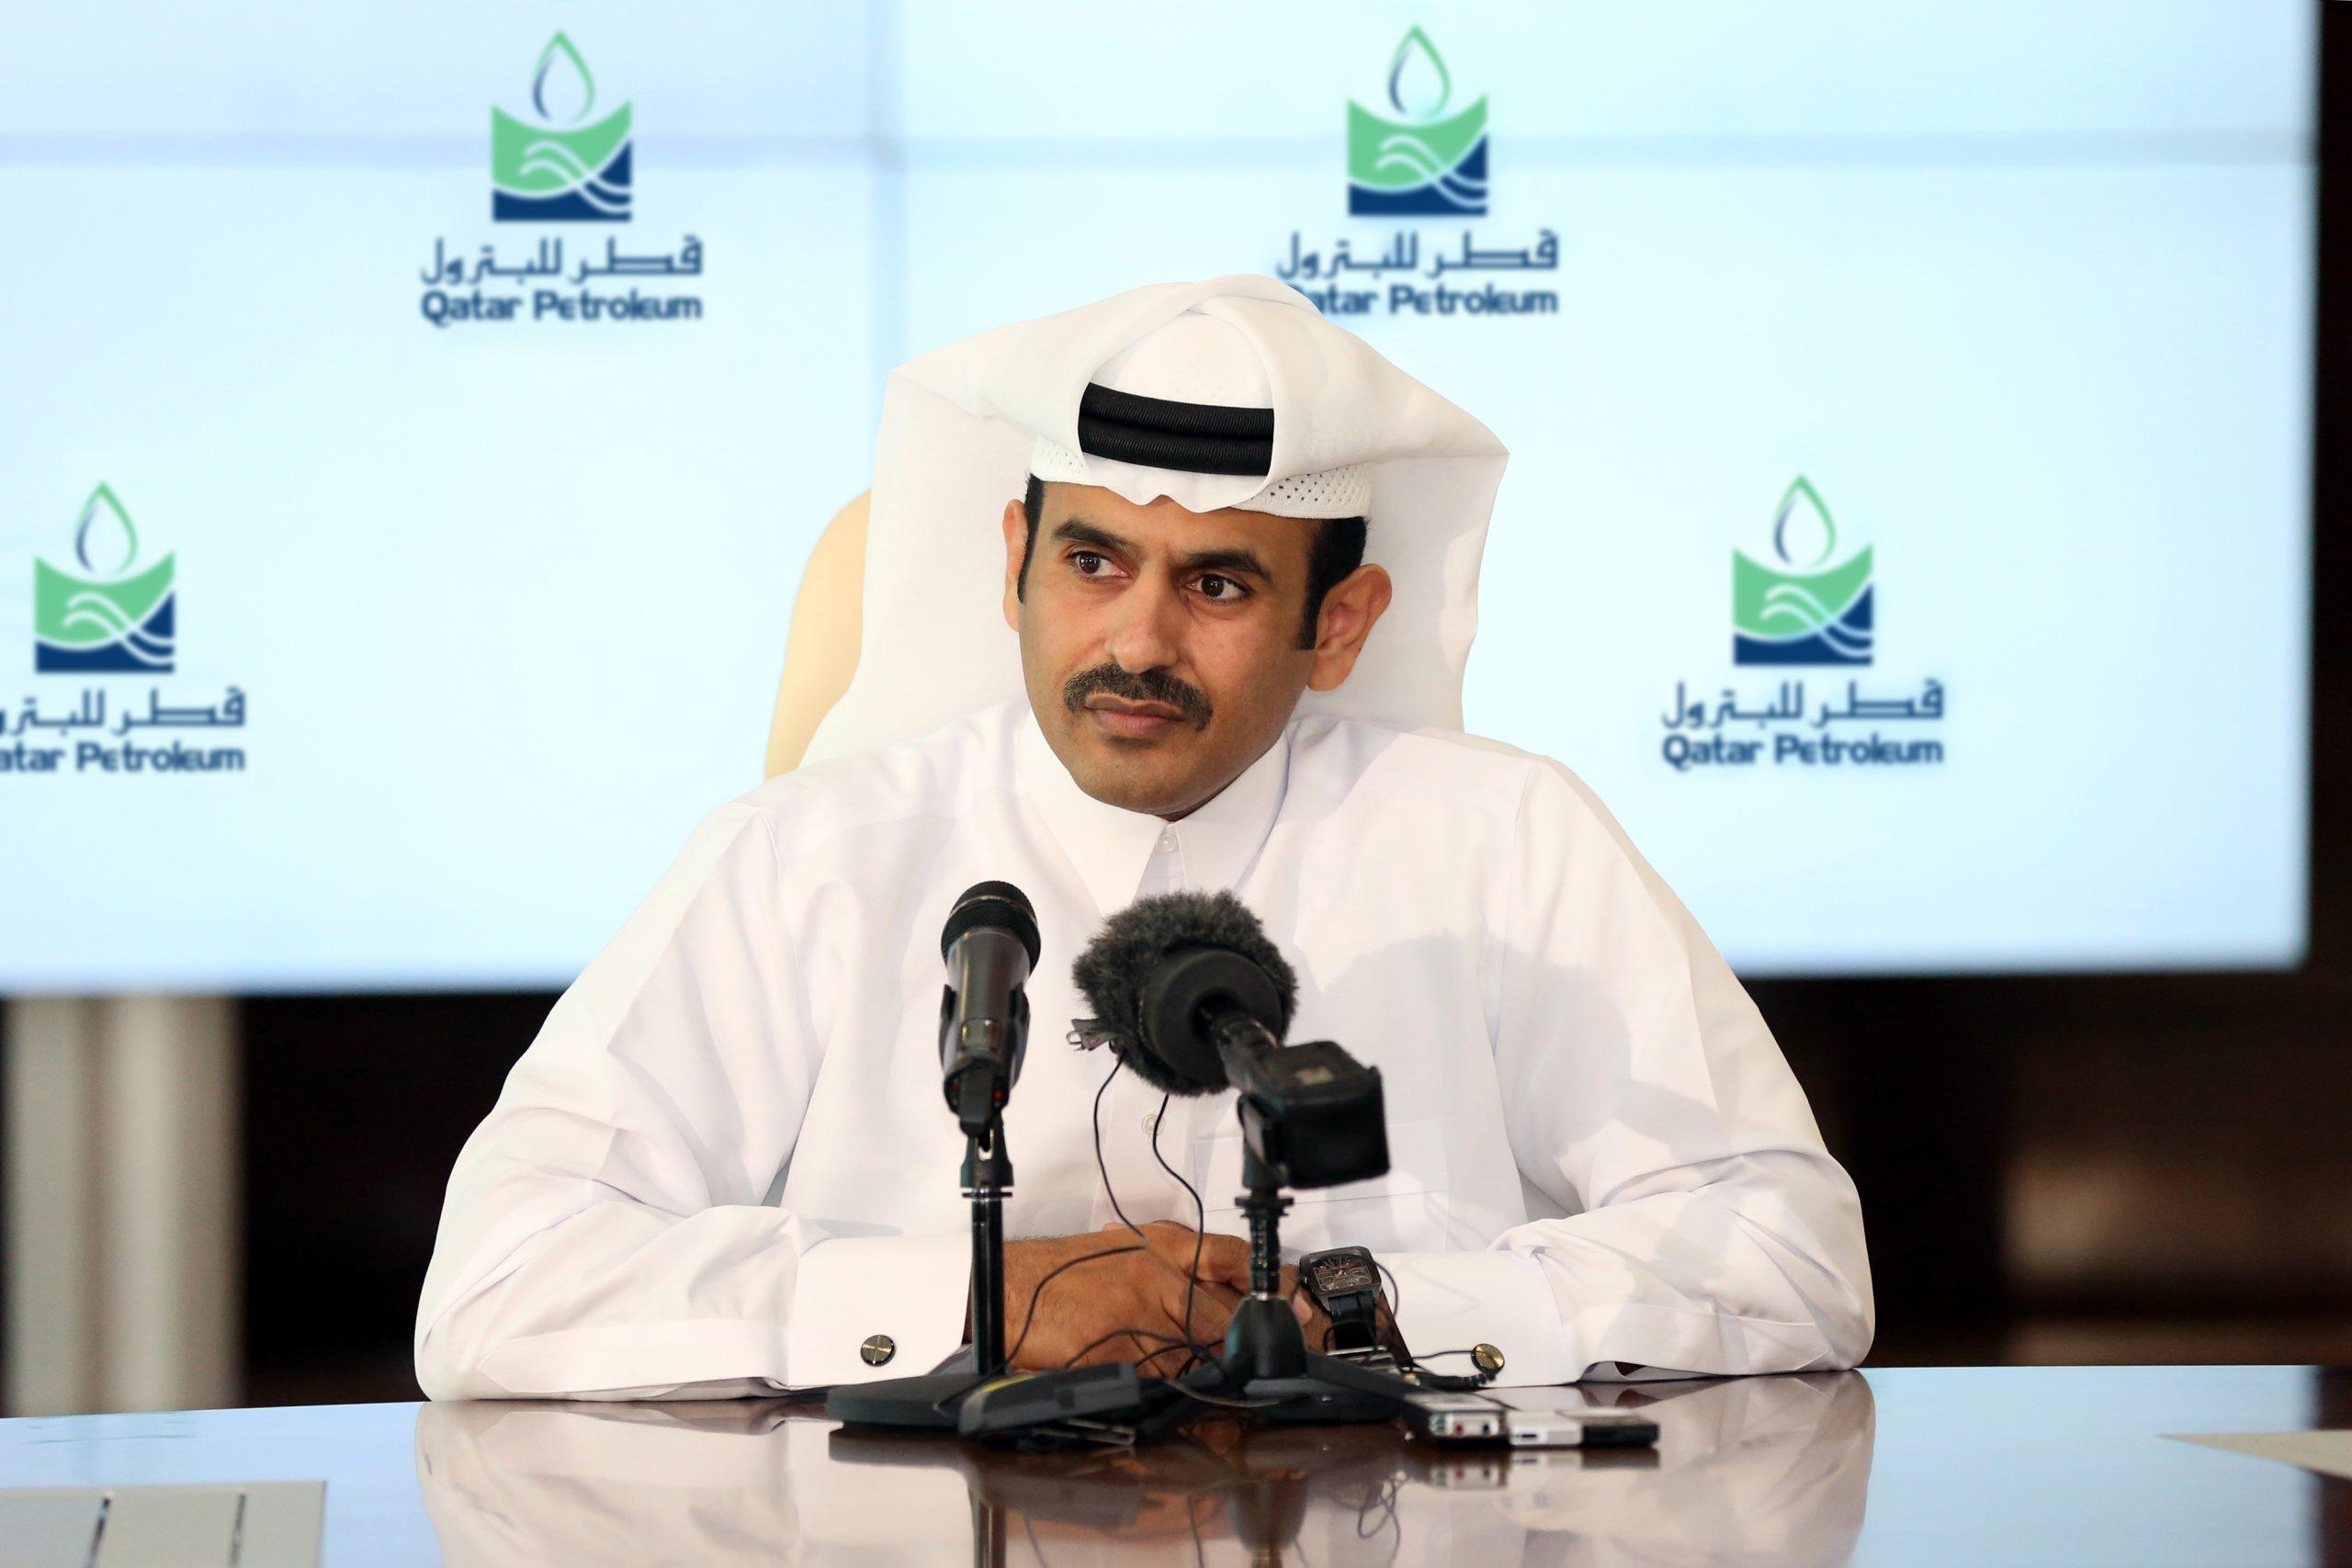 Flooding oil market was a 'very big mistake': Kaabi